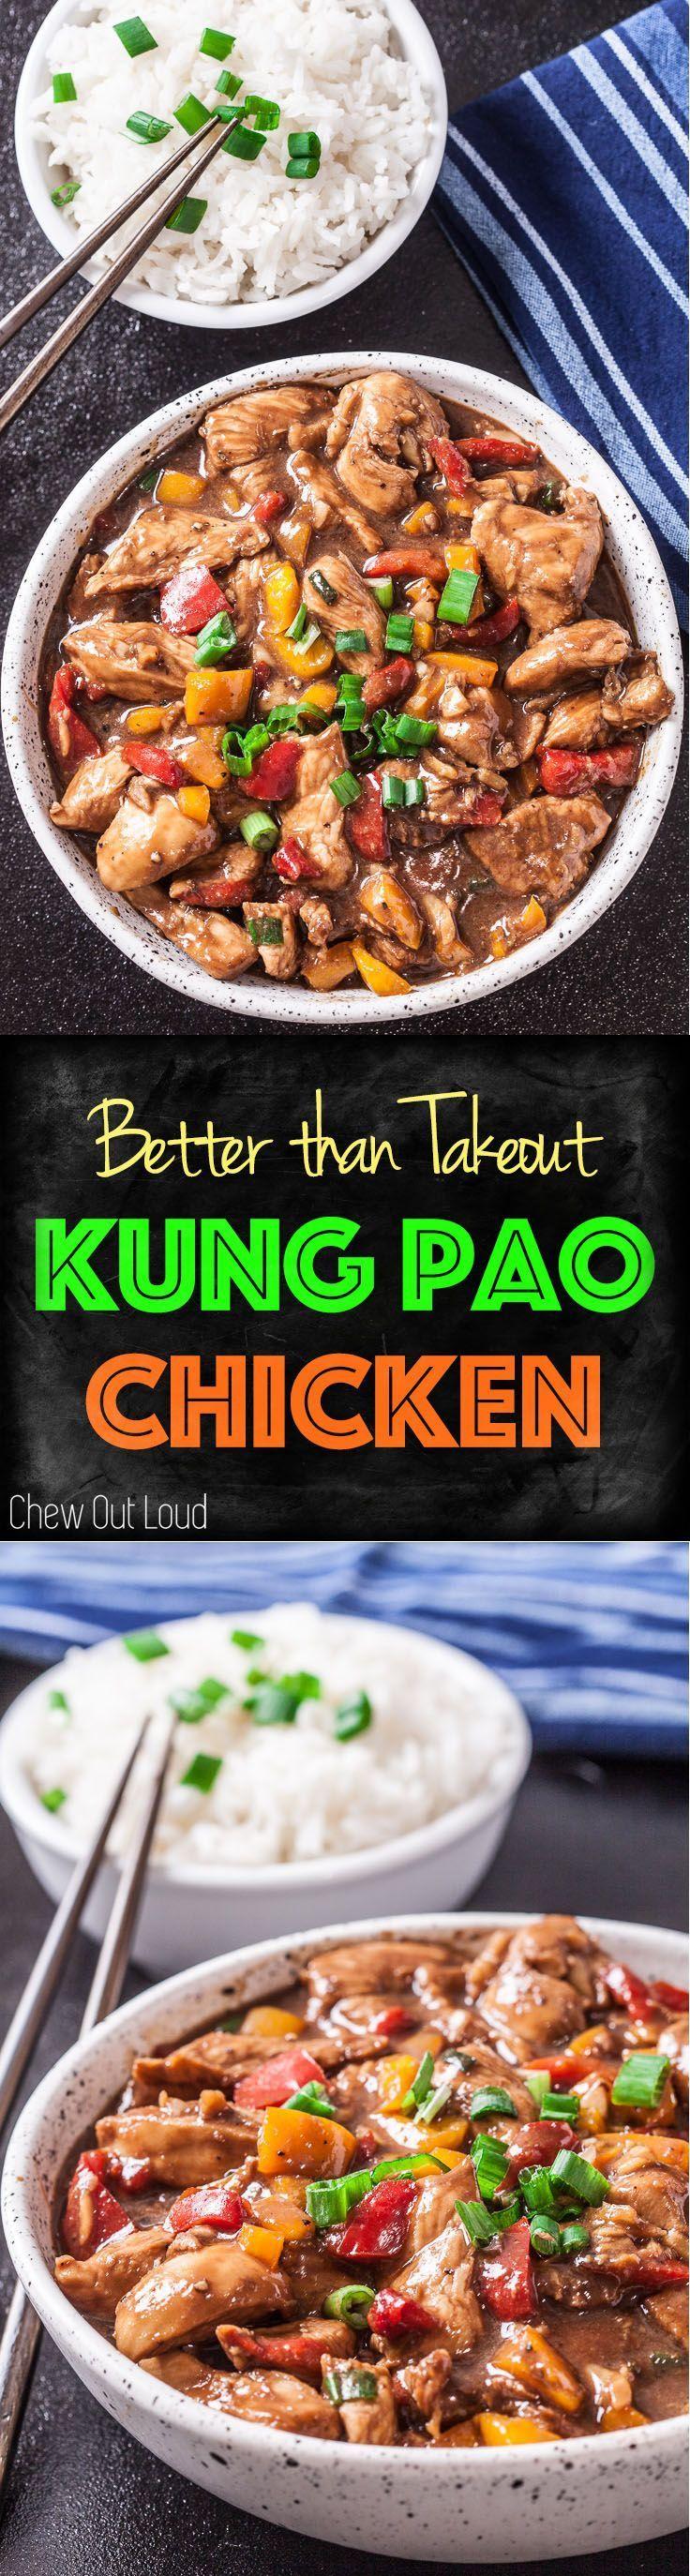 Fast Healthy Kung Pao Chicken #seasonedricerecipes